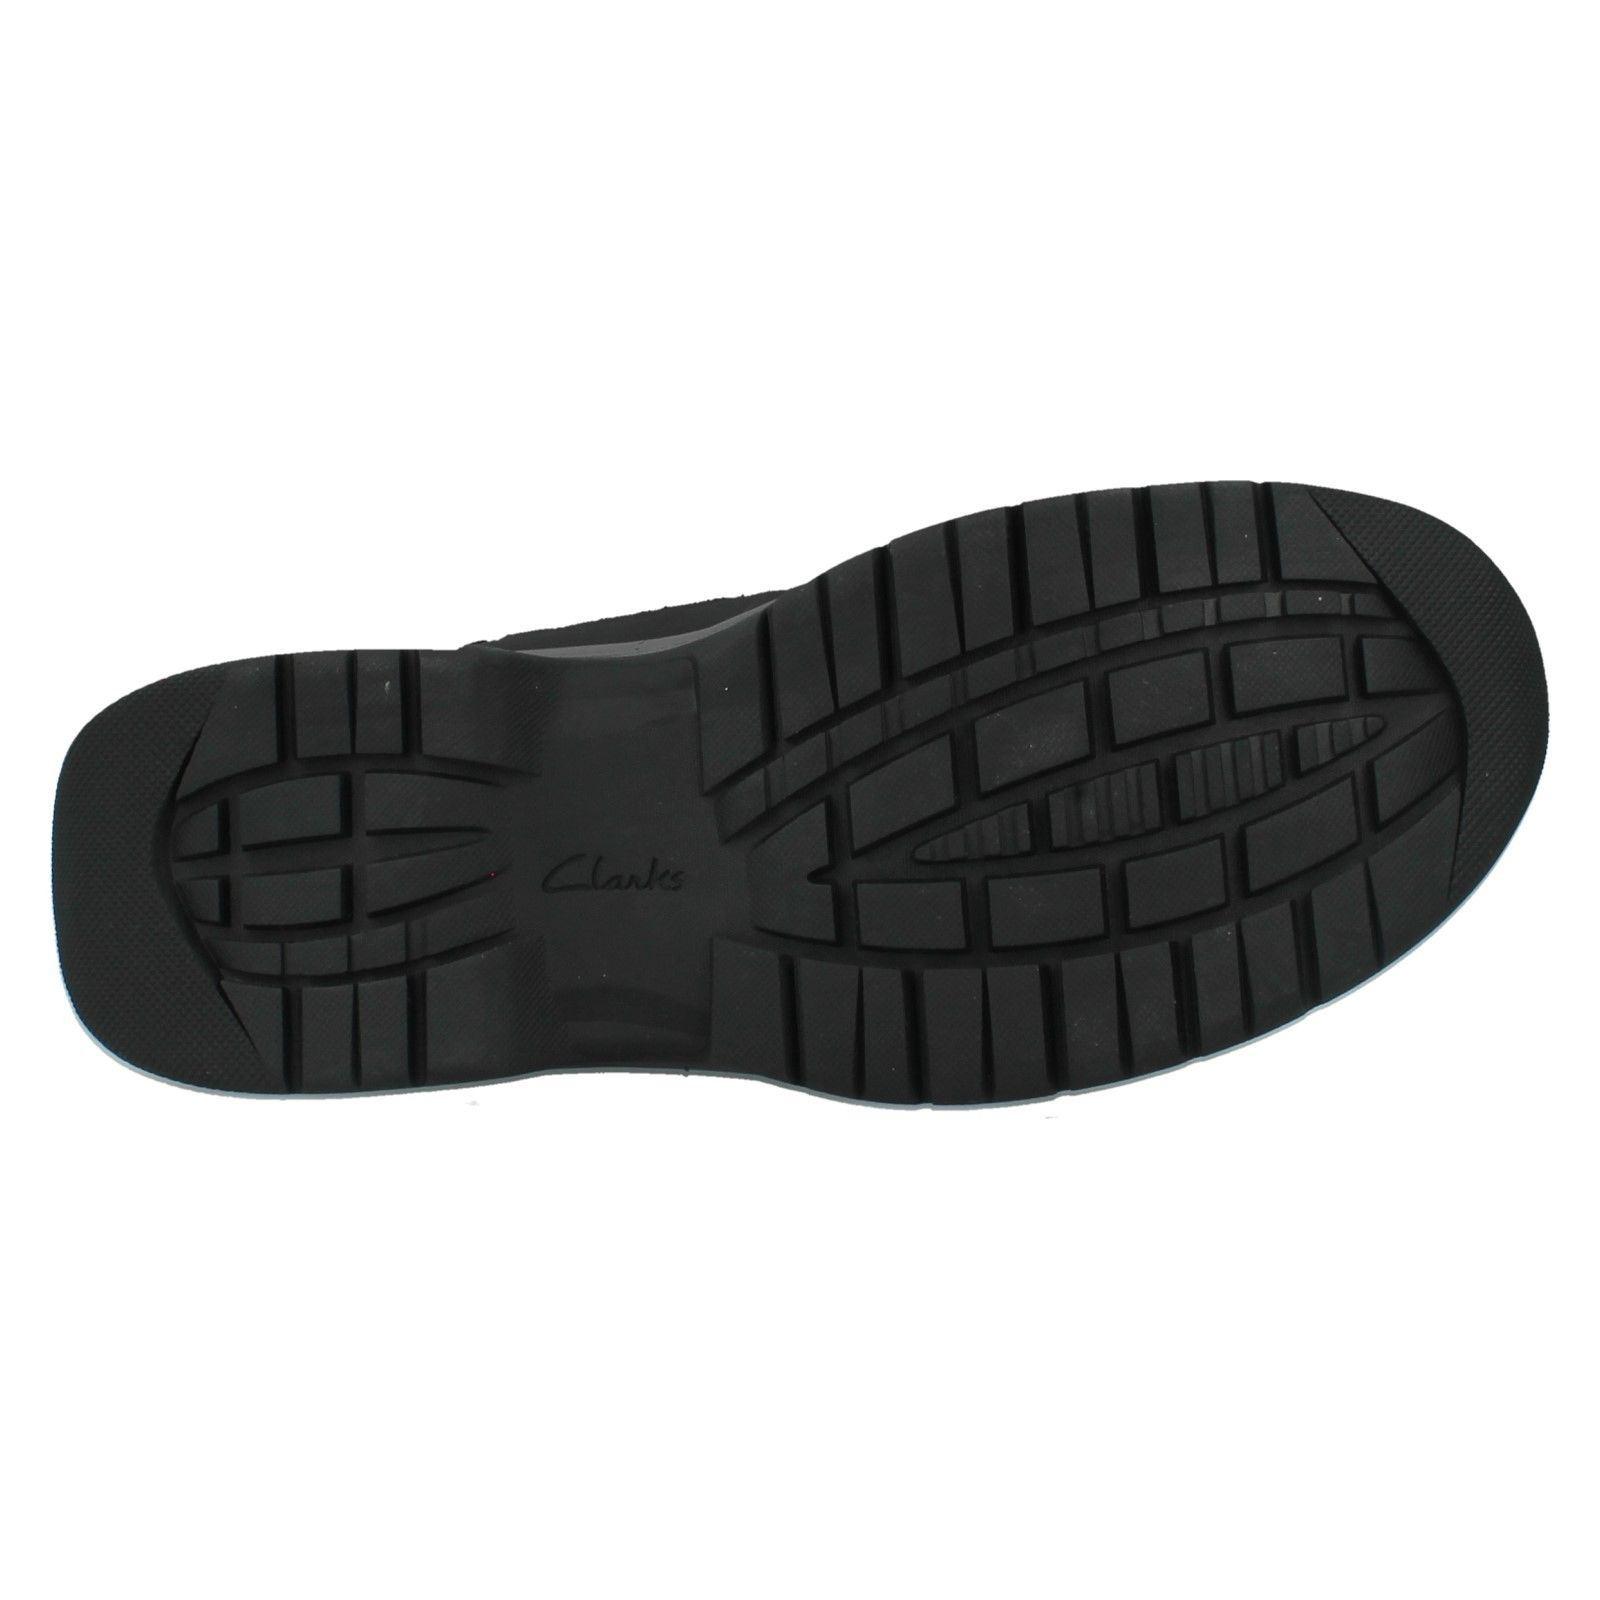 Mens-Clarks-Outdoor-Boots-Nashoba-Summit thumbnail 4